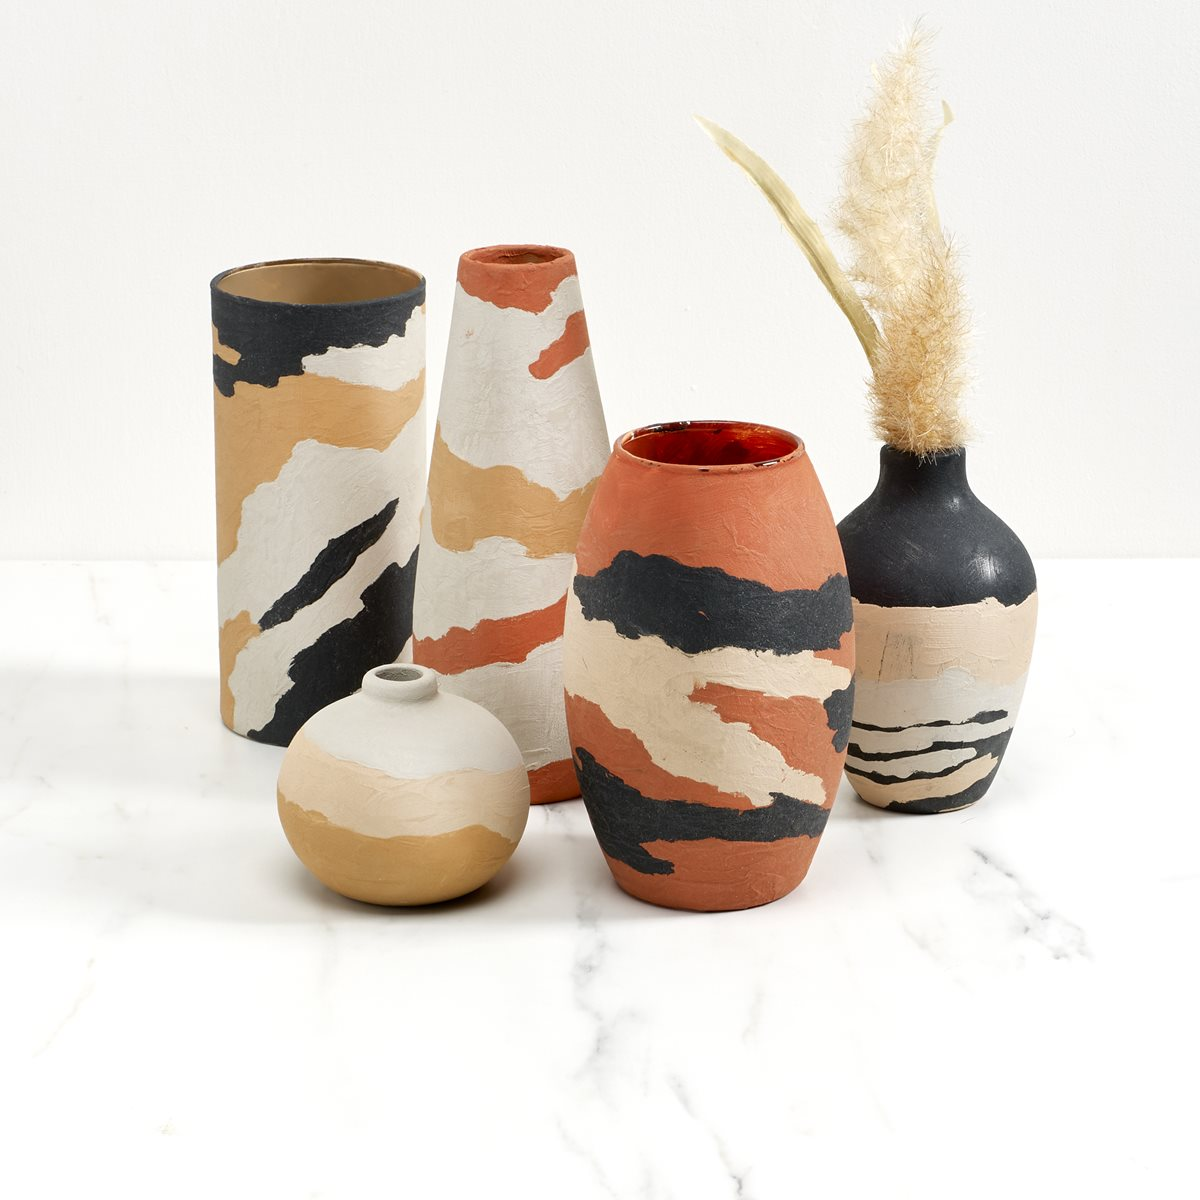 FolkArt Terra Cotta Abstract Pattern Vases